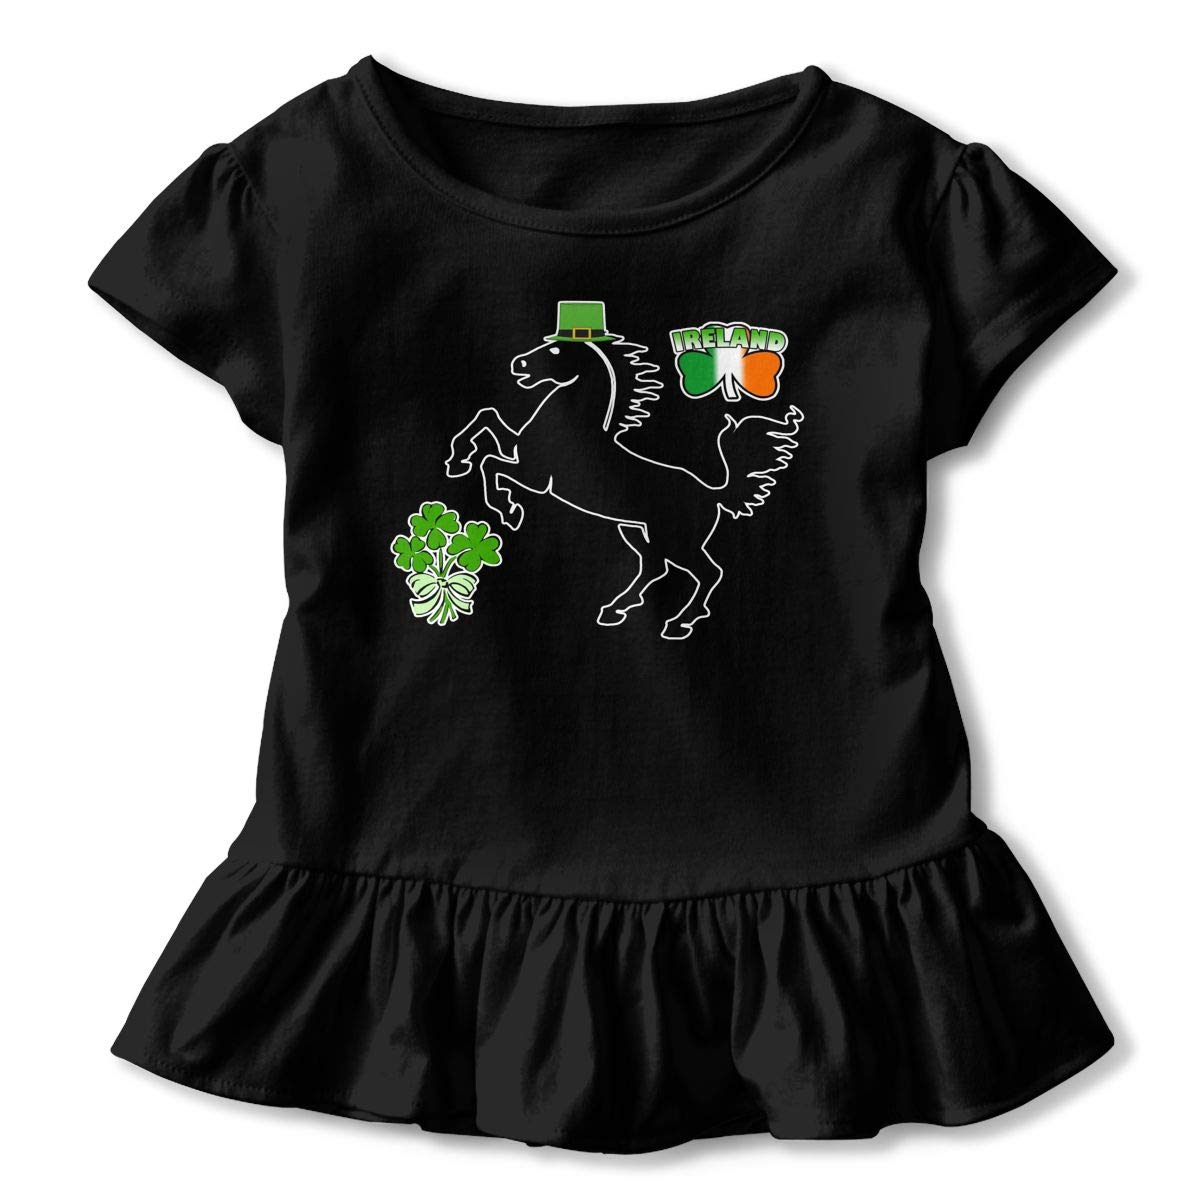 ZP-CCYF St Patricks Day Irish Horse Toddler Baby Girl Ruffle Short Sleeve T-Shirt Soft Cotton T Shirts